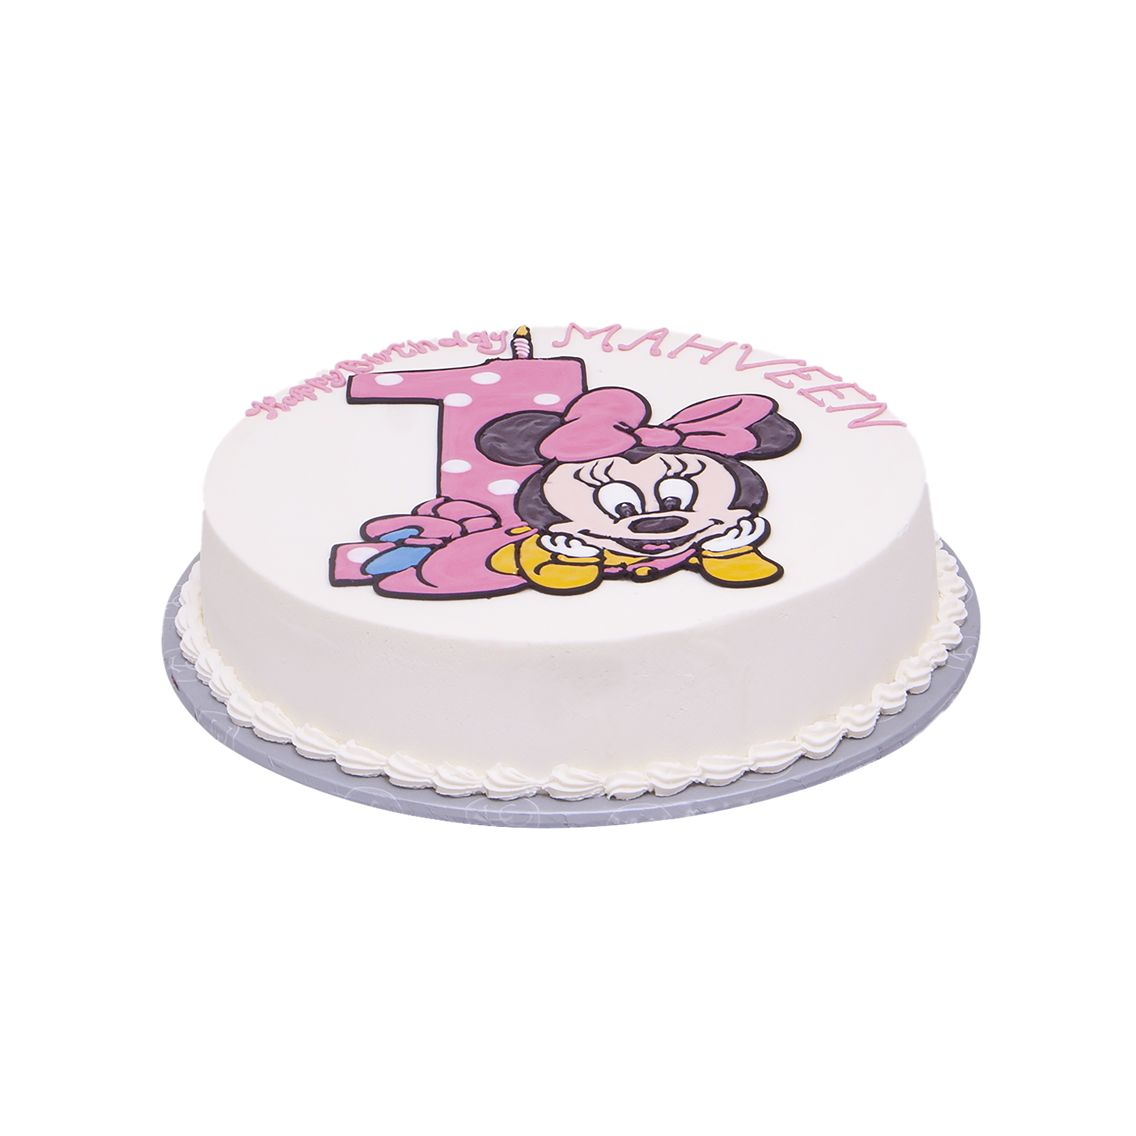 Kitchen Cuisine Default Category Minnie mouse cake